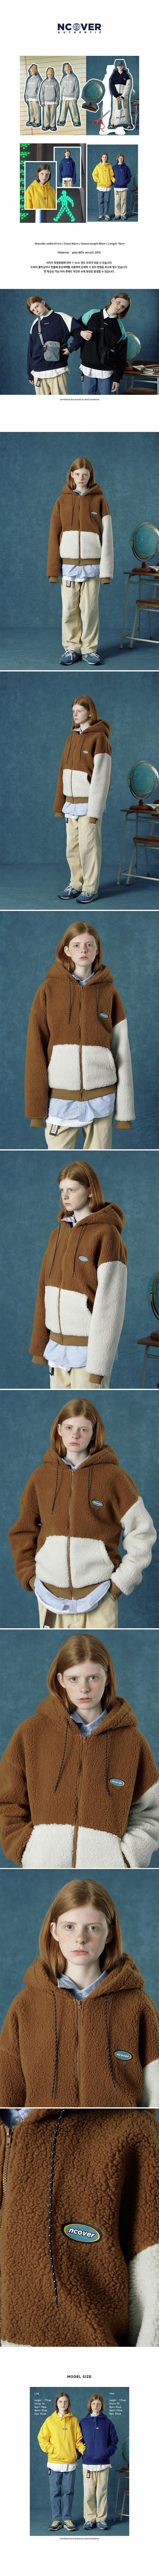 Ncover fleece hoodie zipup-camel.jpg